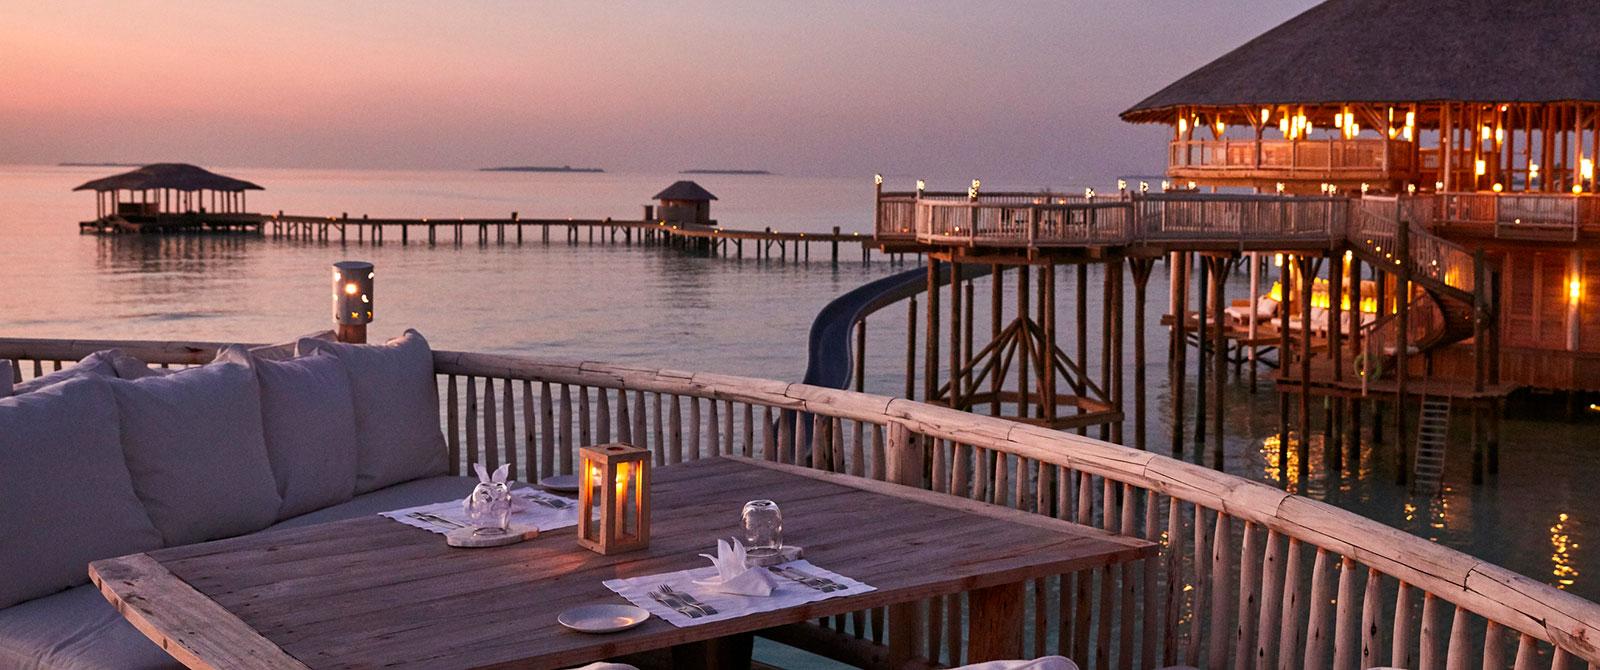 Soneva Jani Resort - So Starstruck Restaurant - Maldives Overwater Bungalow Vacation